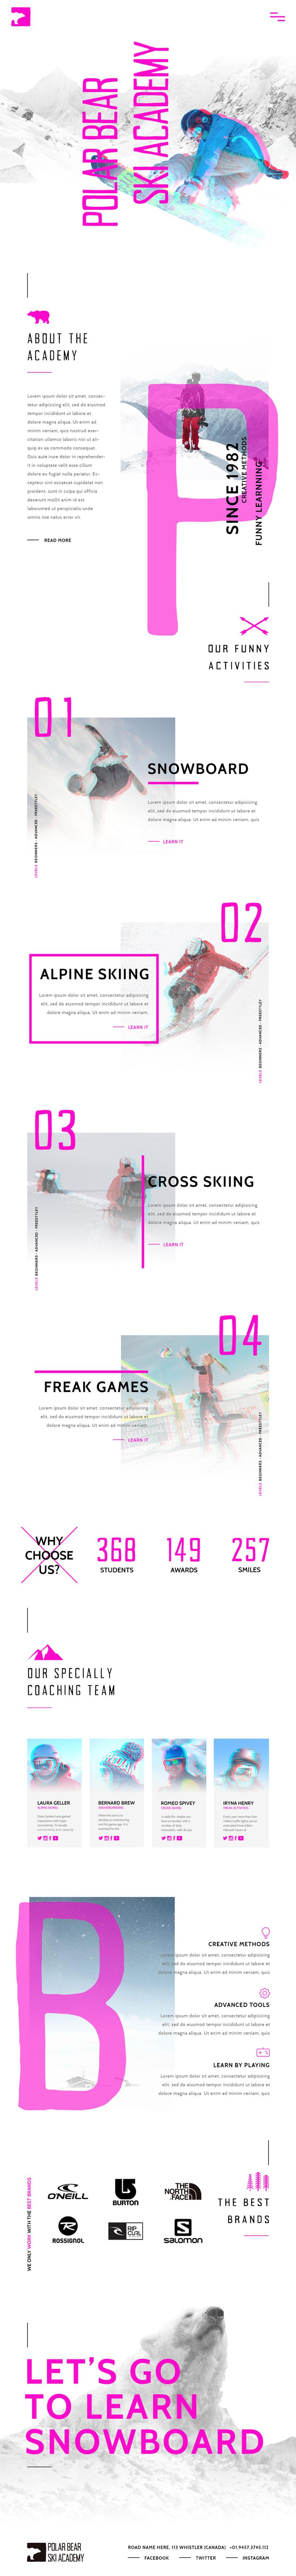 Ski Academy Web Design Concept 0